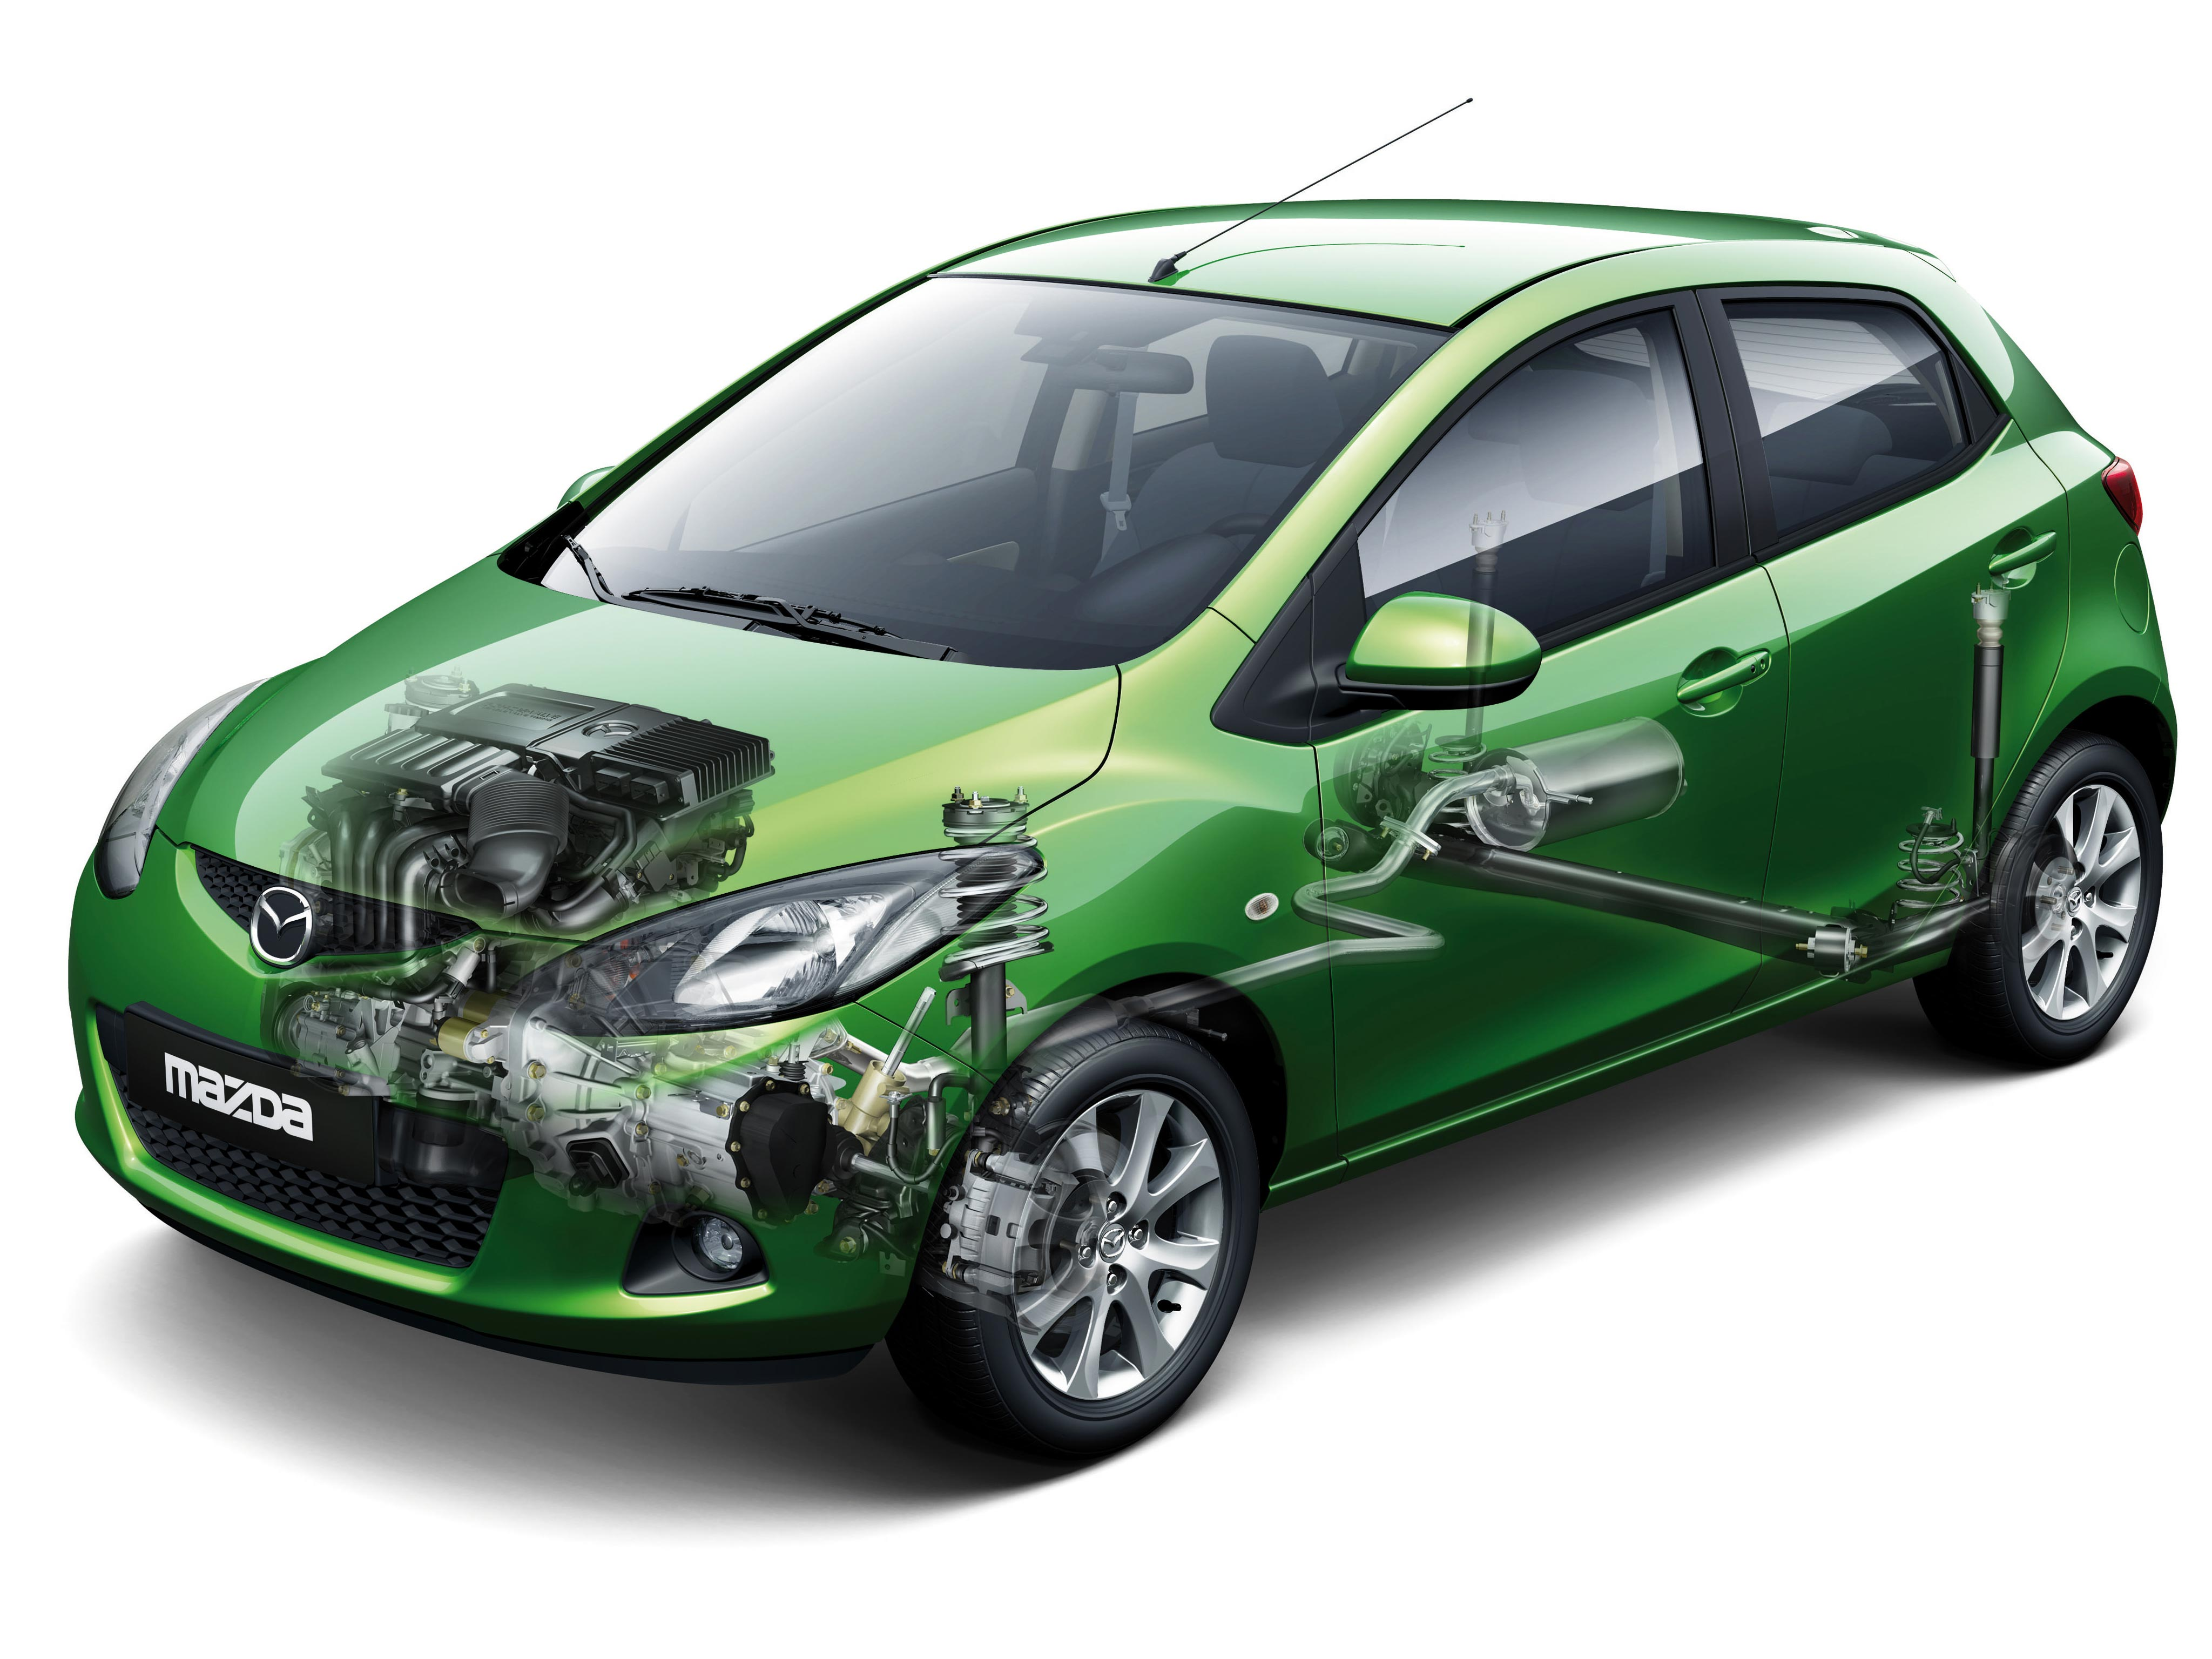 Mazda2 cutaway drawing